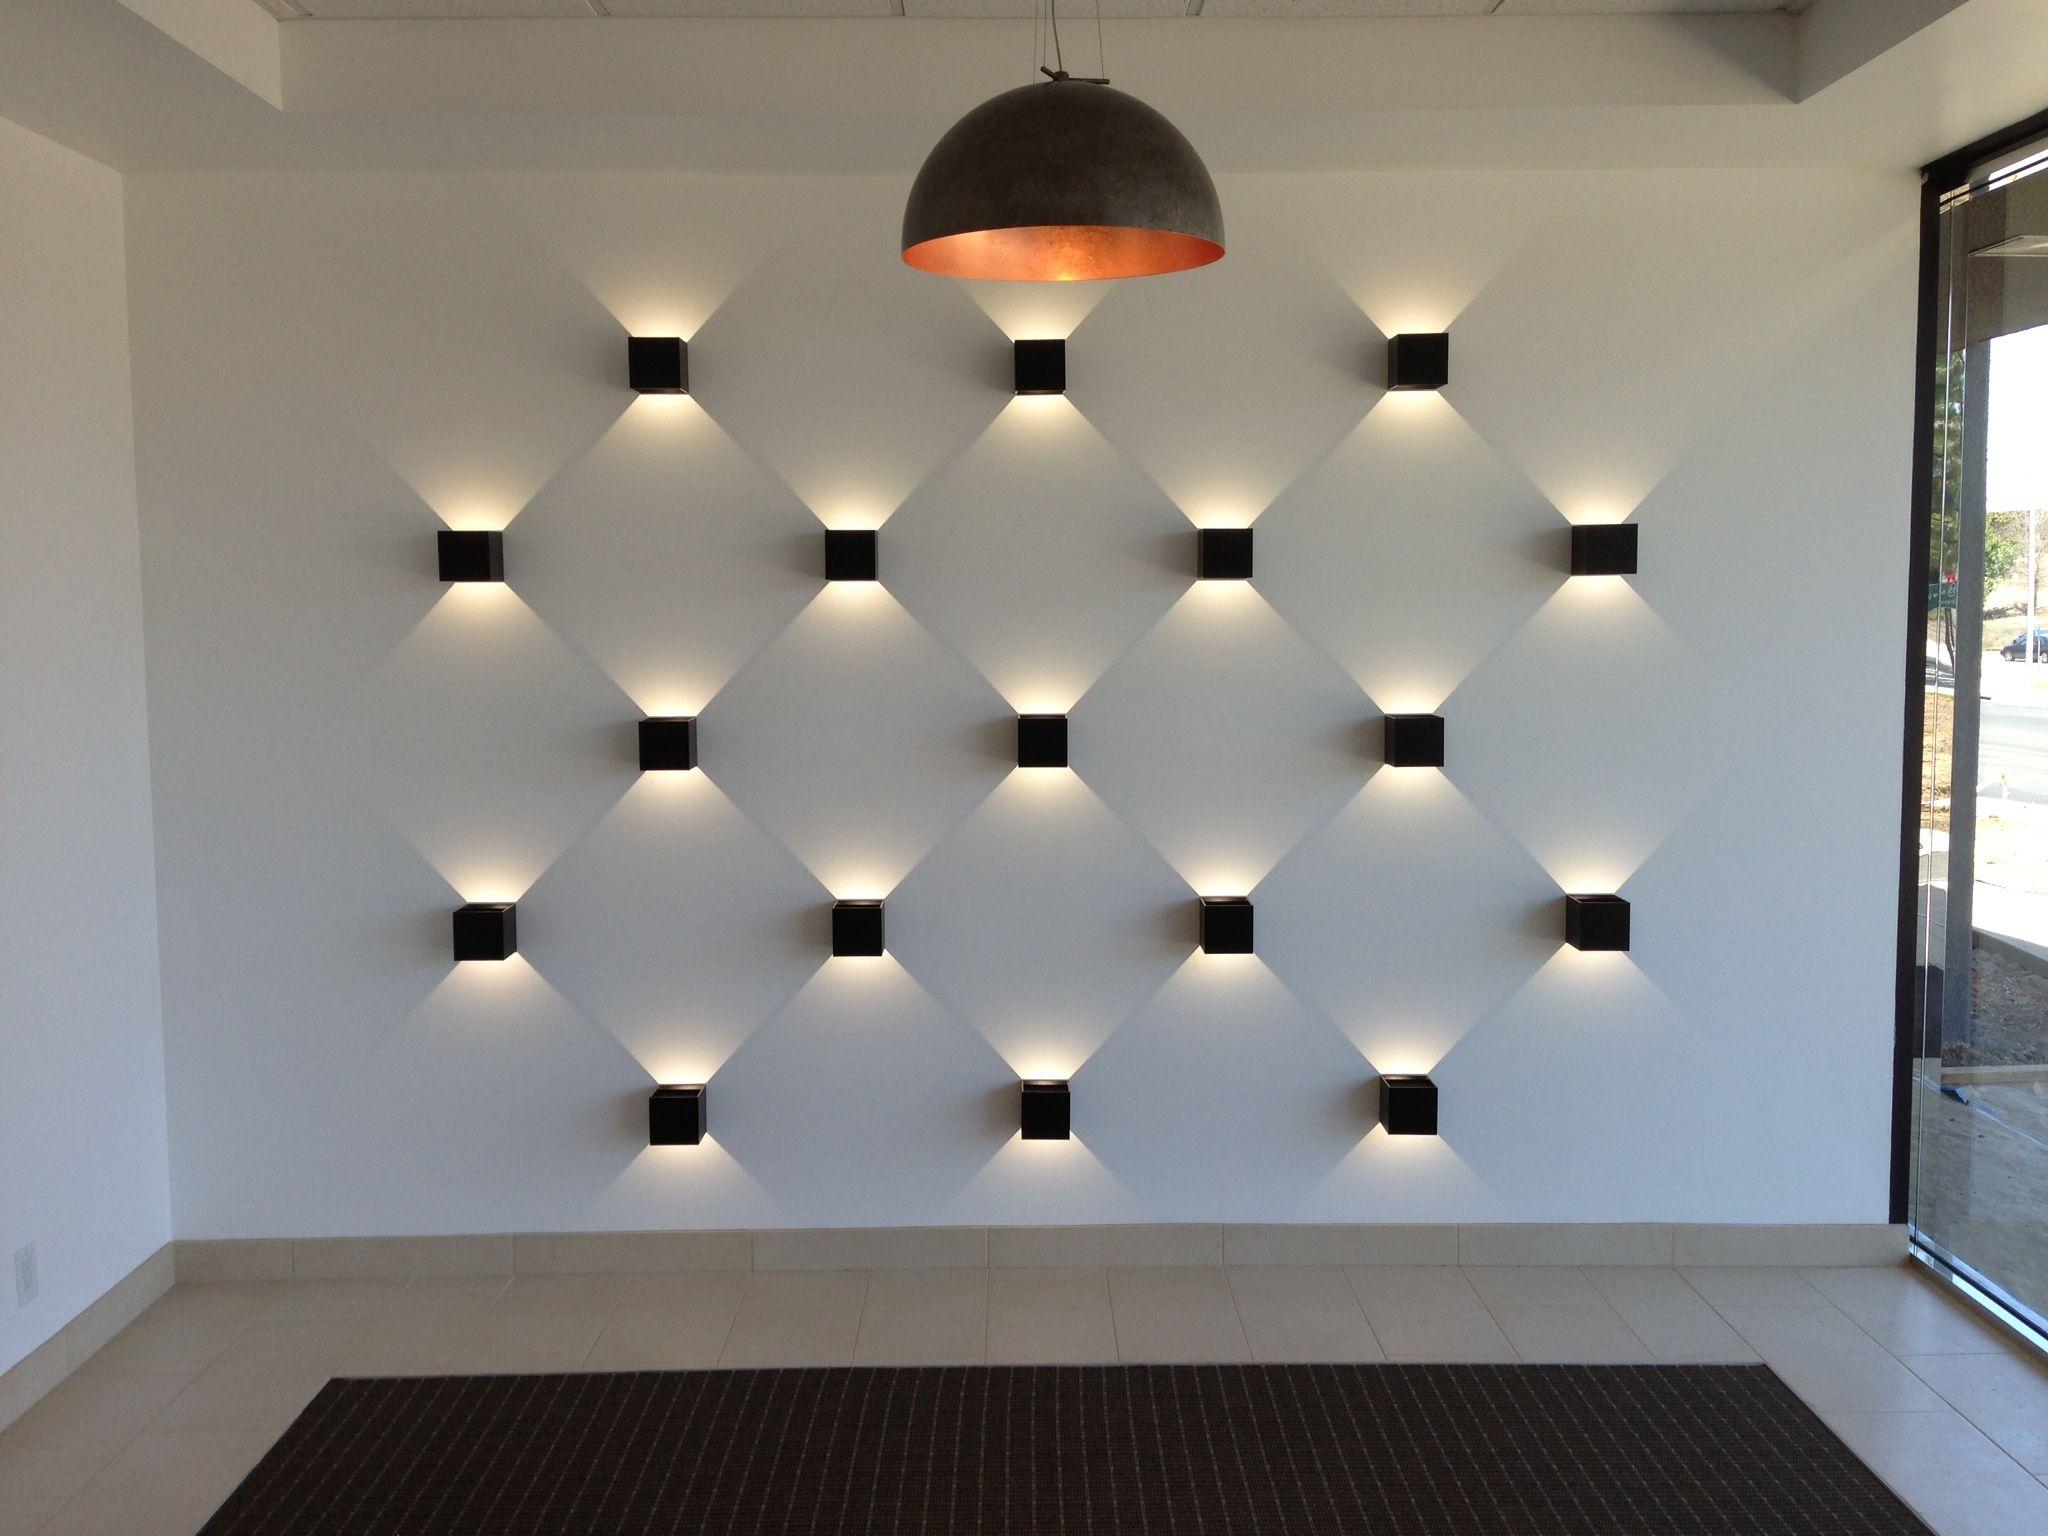 Amazing lines of light created using Prolicht Dice. #Interiordesign #lightingdesign & Amazing lines of light created using Prolicht Dice ... azcodes.com